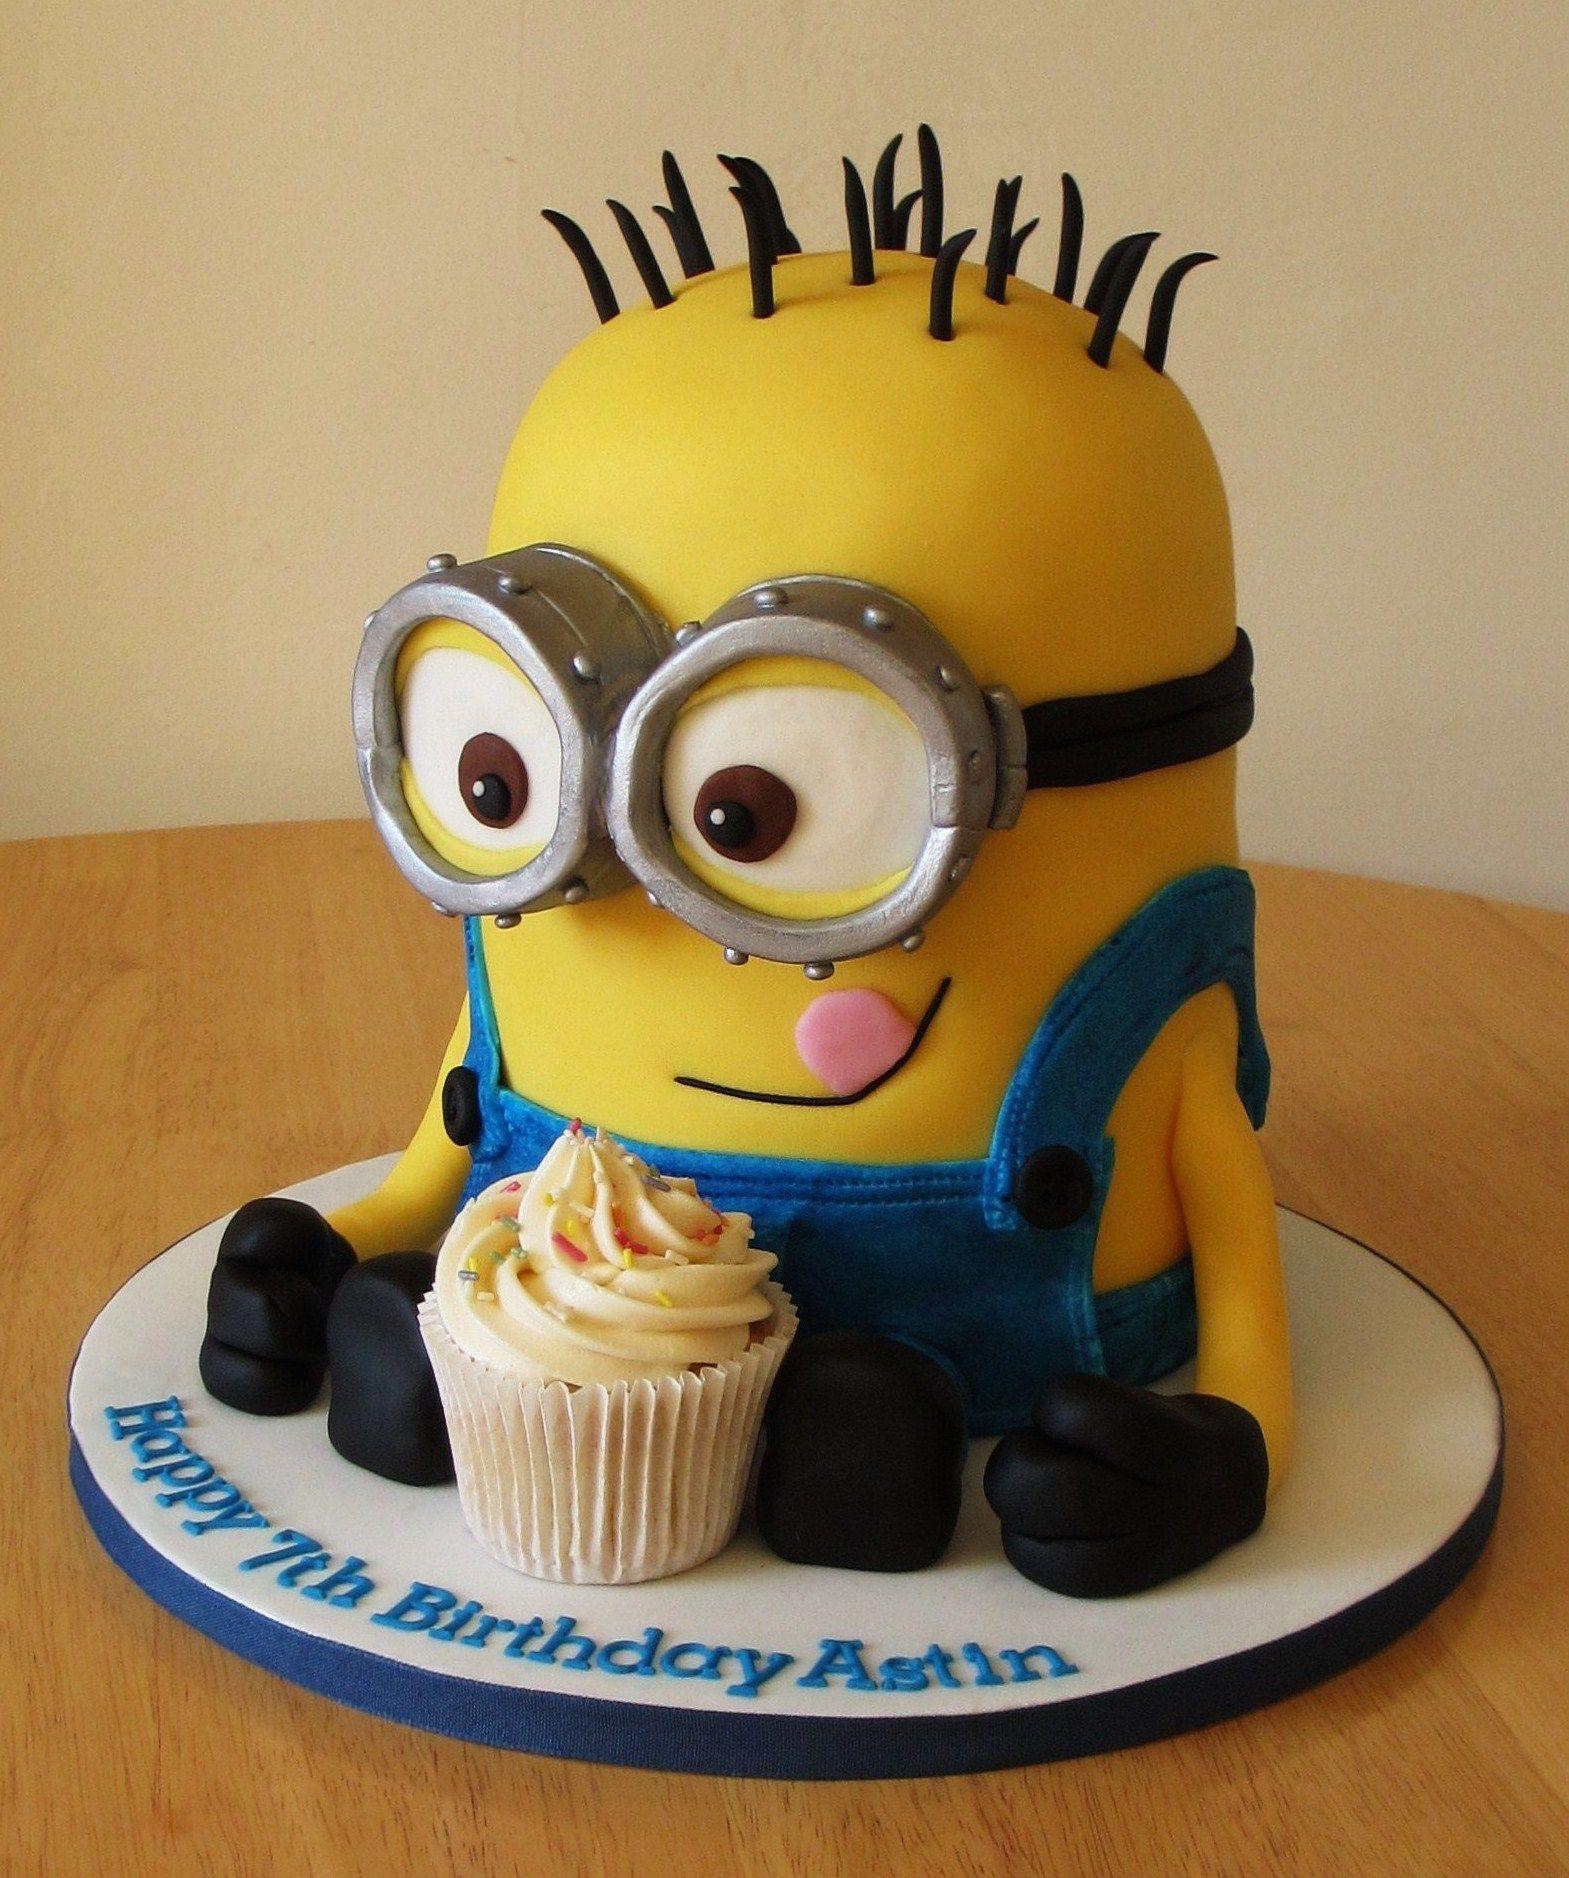 Minion Cake Dave Celebration Cakes By Alice Carley